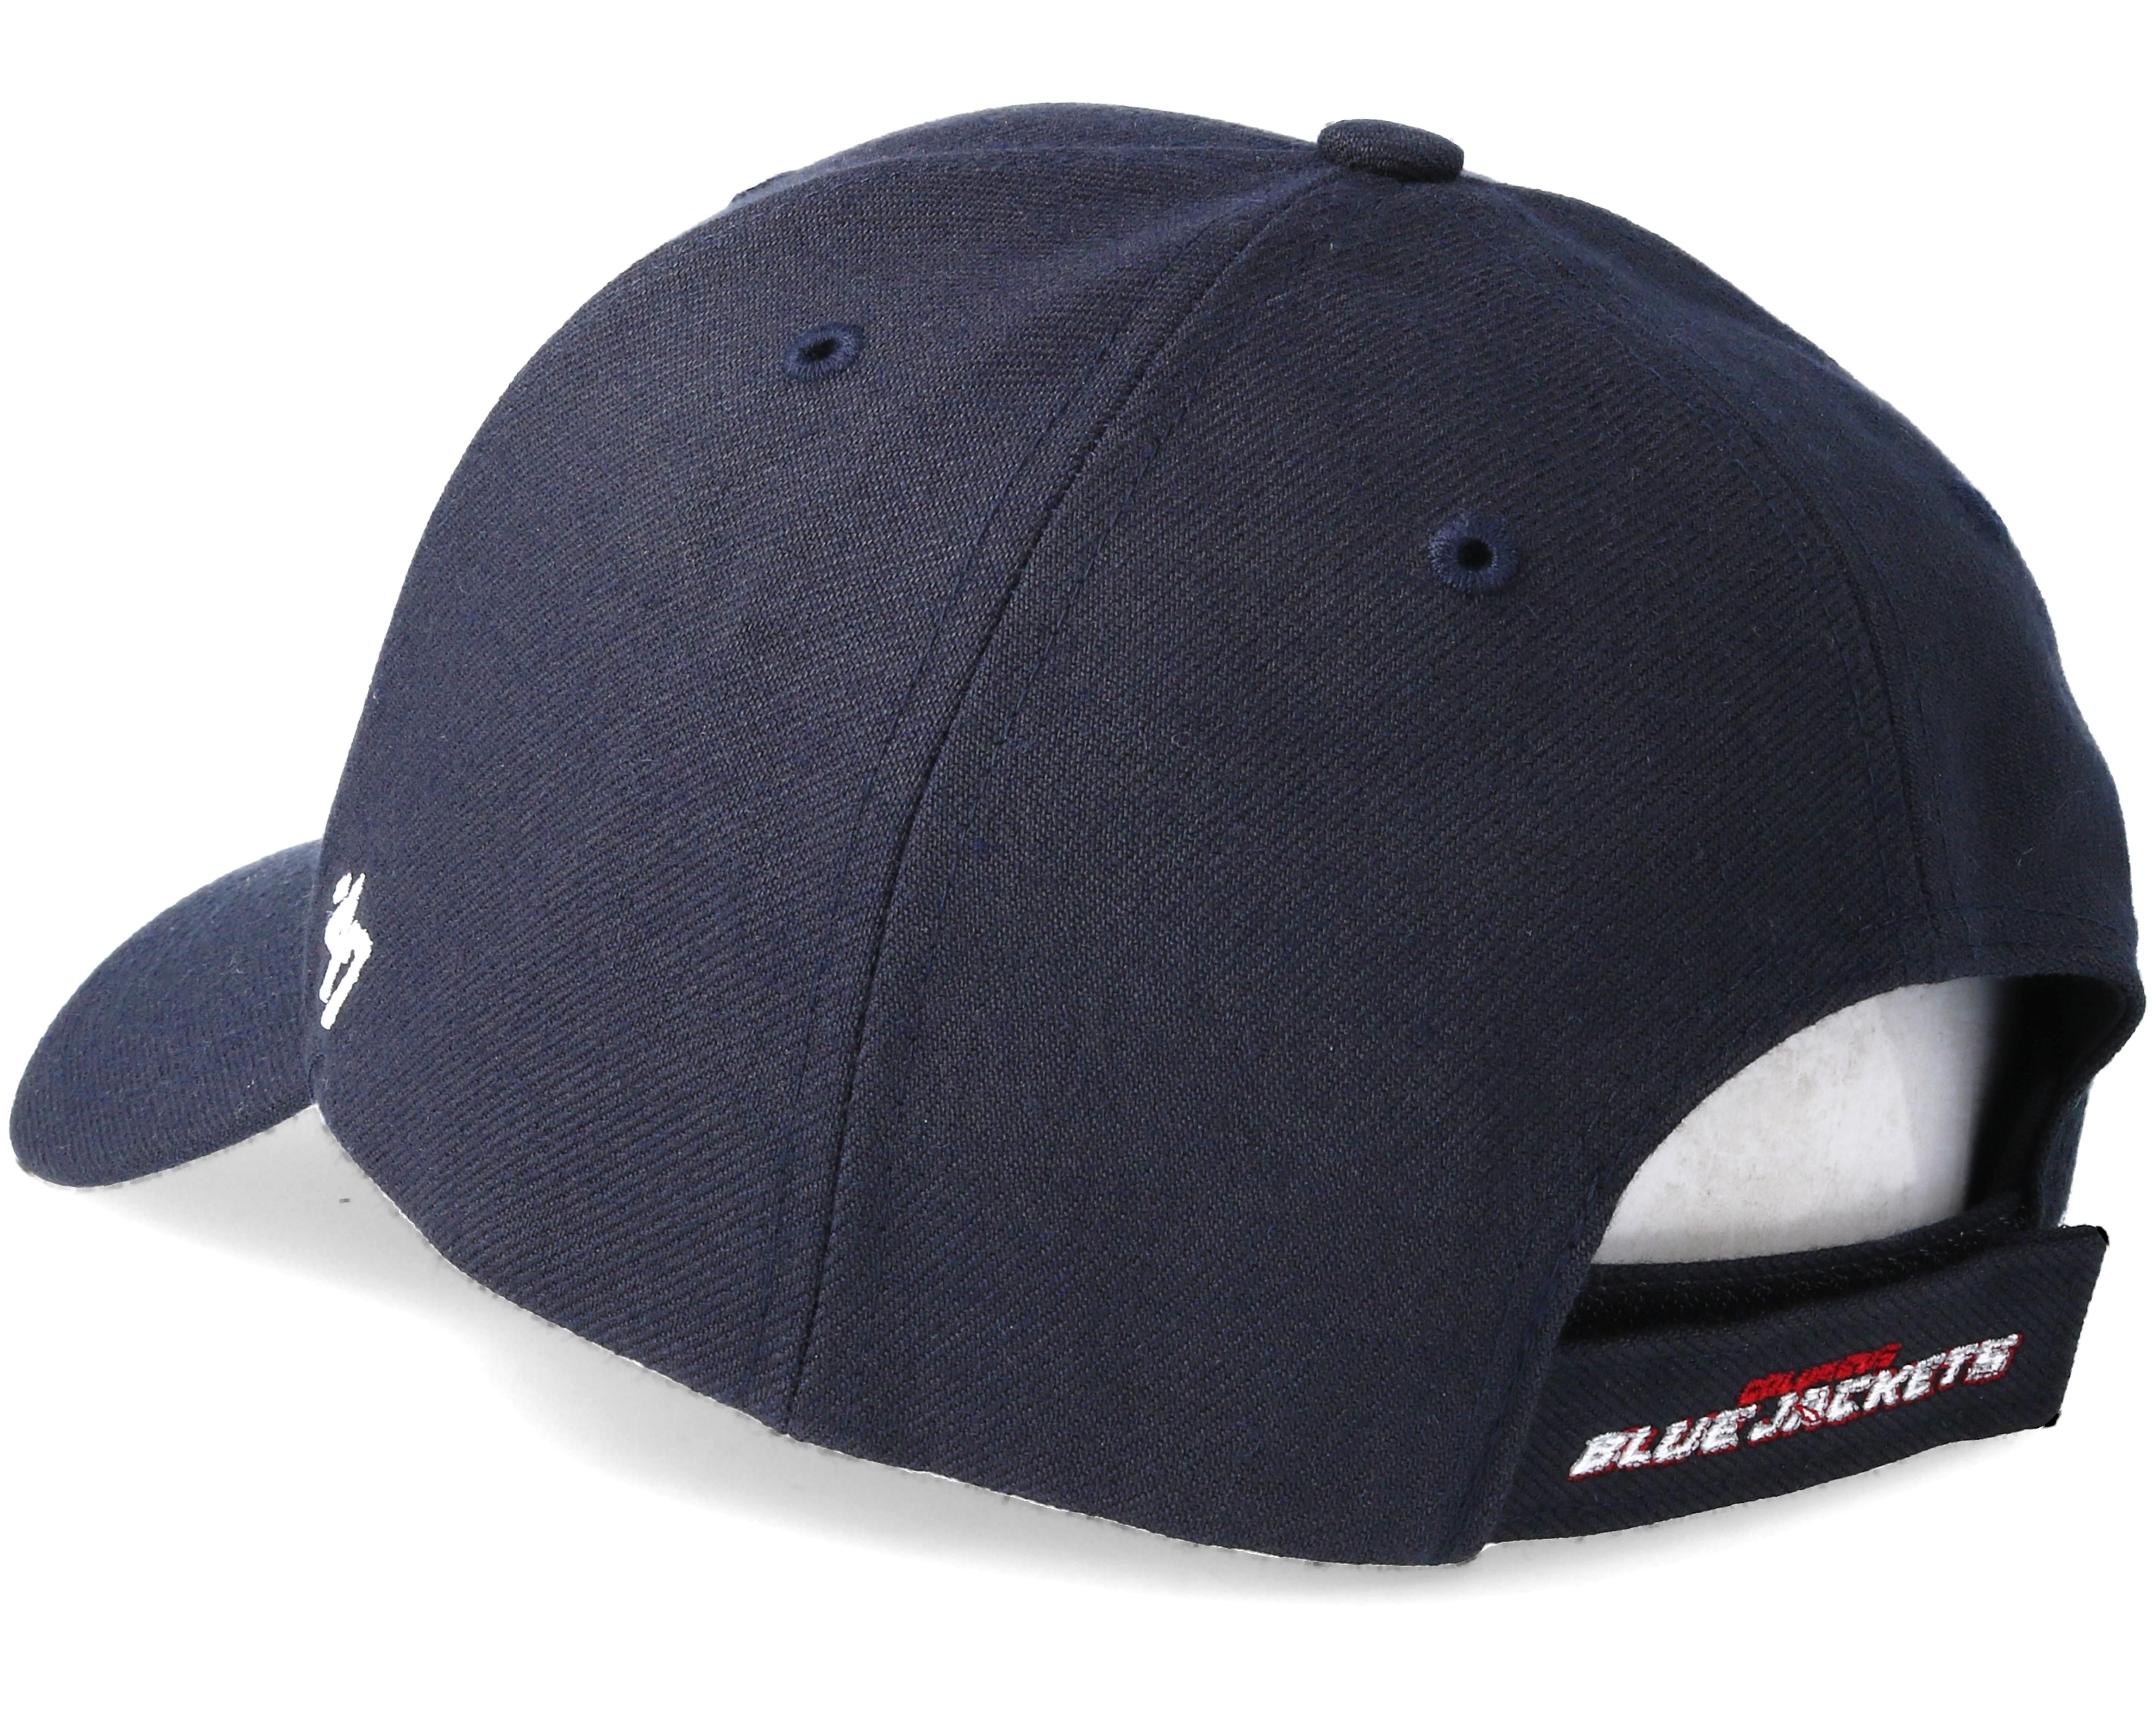 Columbus Blue Jackets Apparel